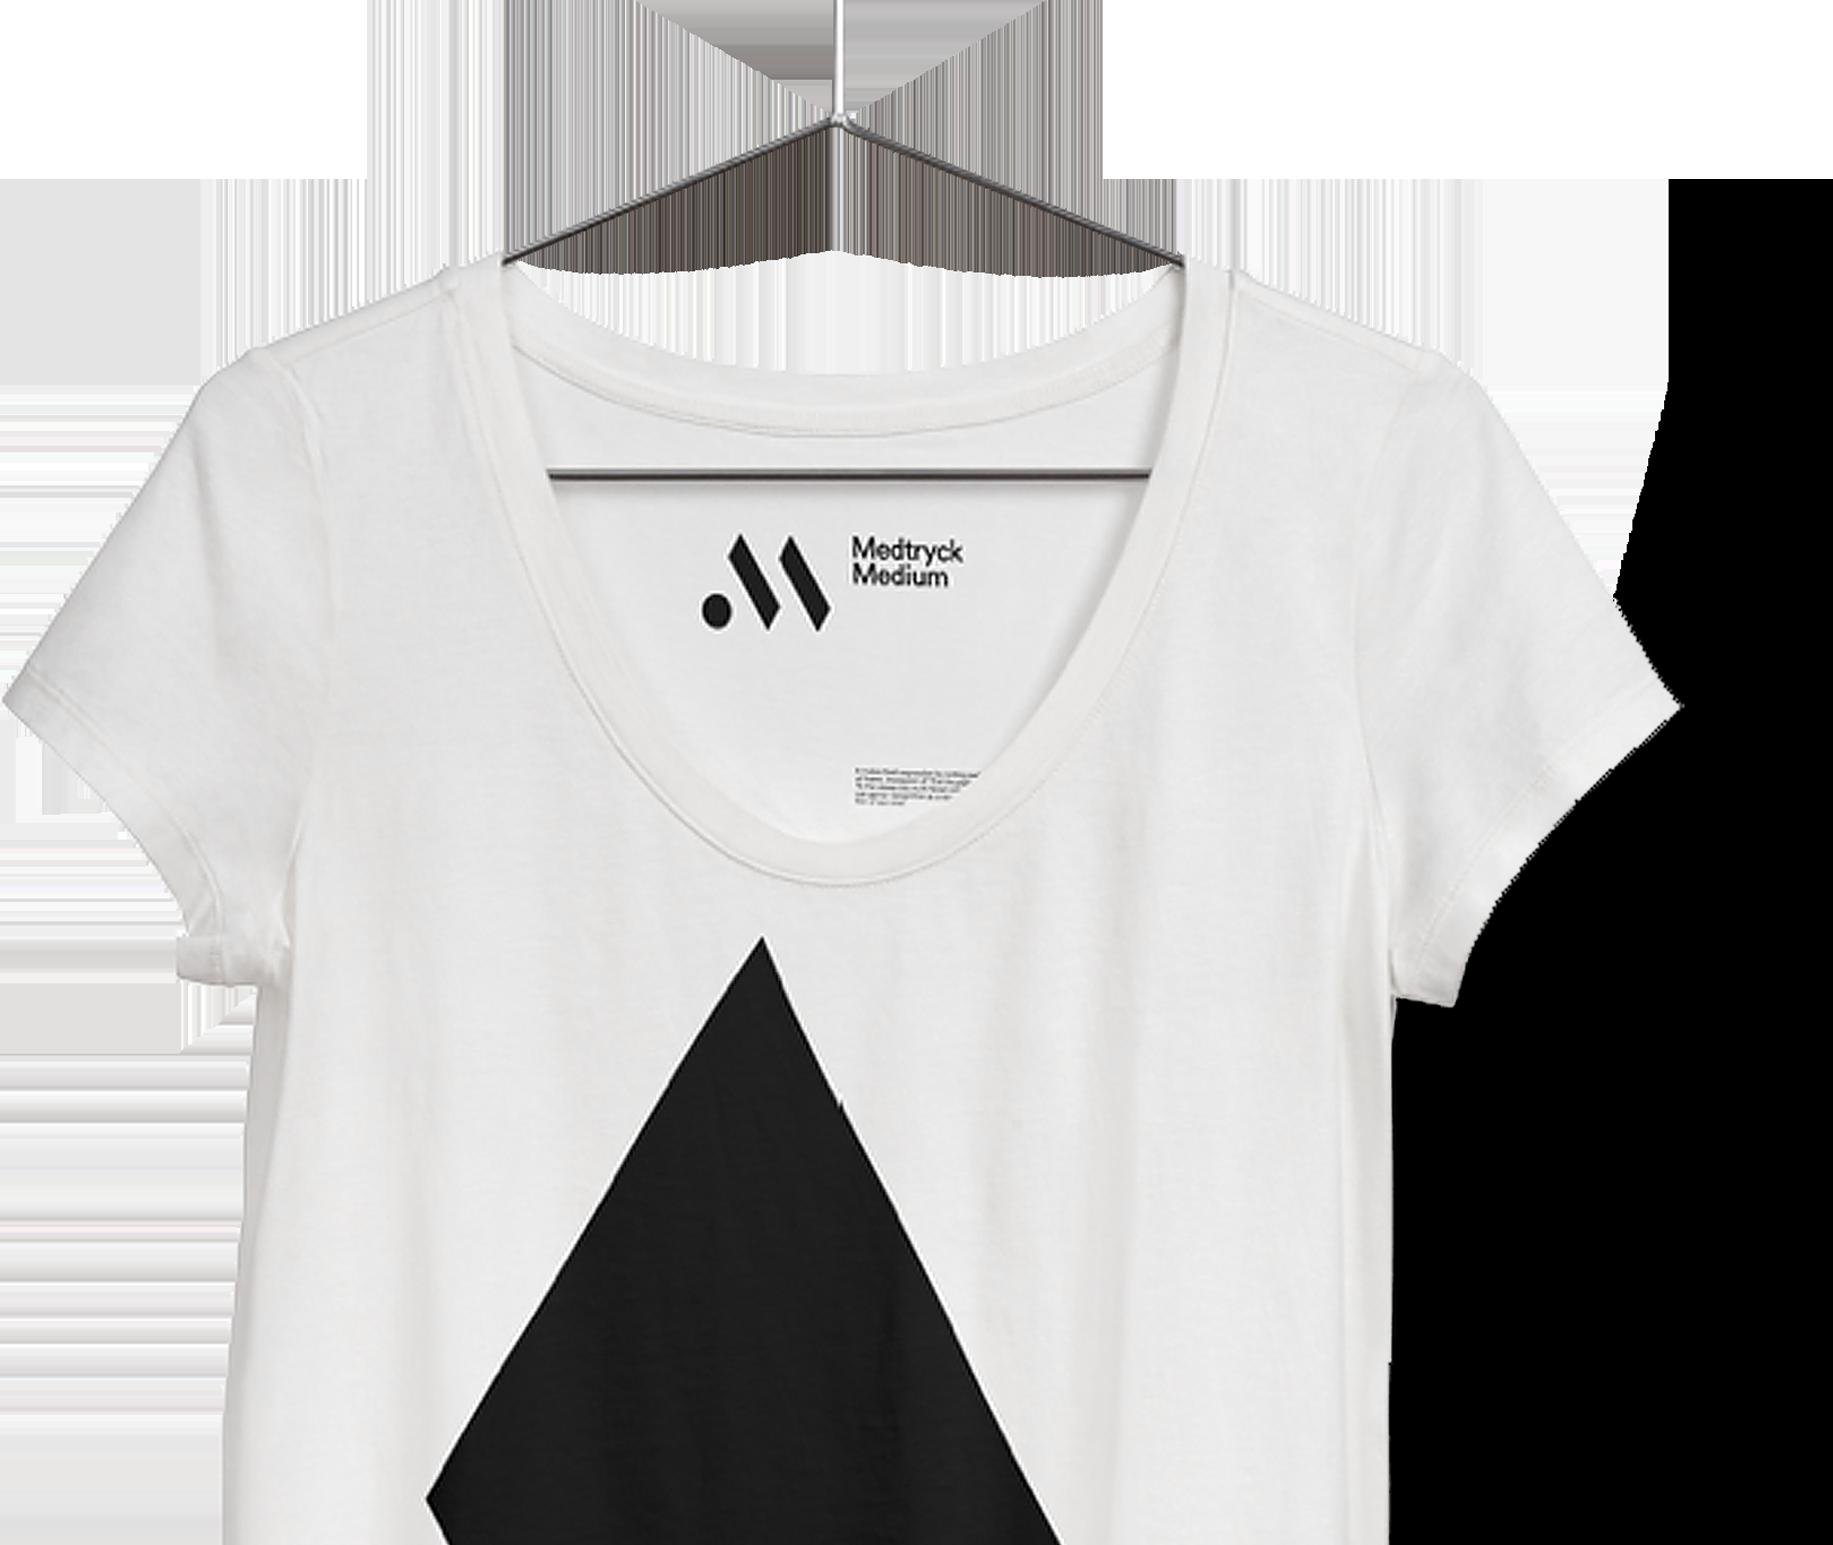 7lkggvt33w_t_shirt3